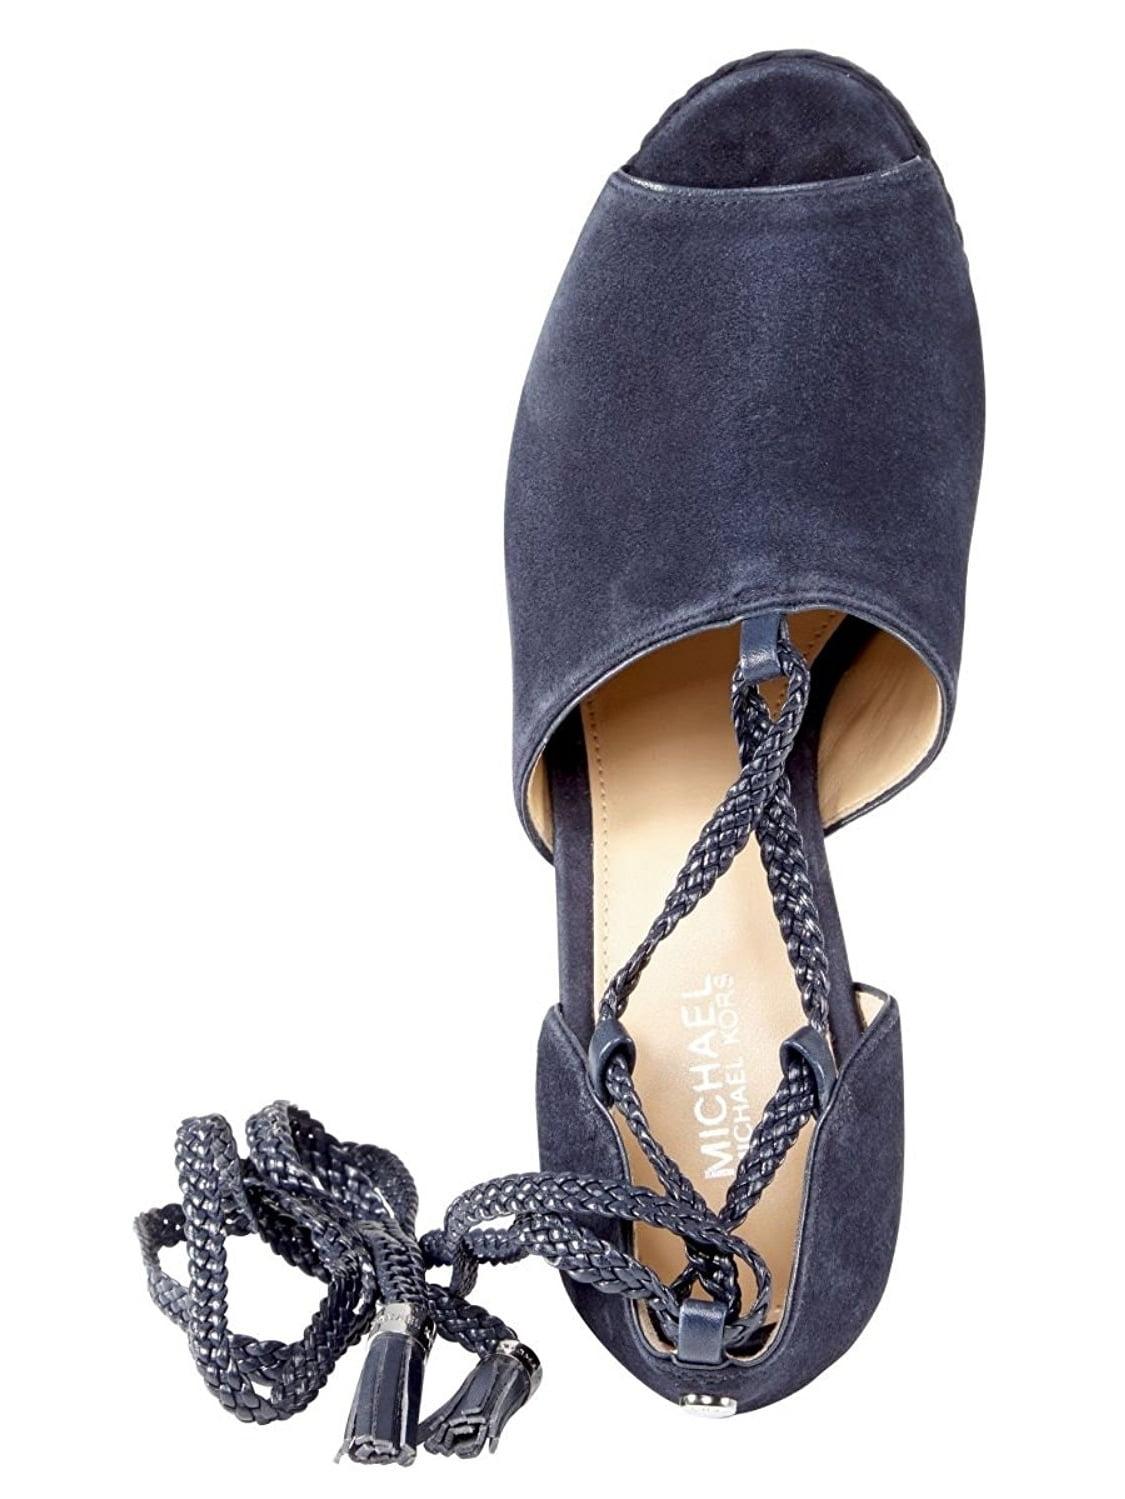 7280d4890077 michael-kors - michael kors hastings lace up wedge heels admiral blue -  Walmart.com